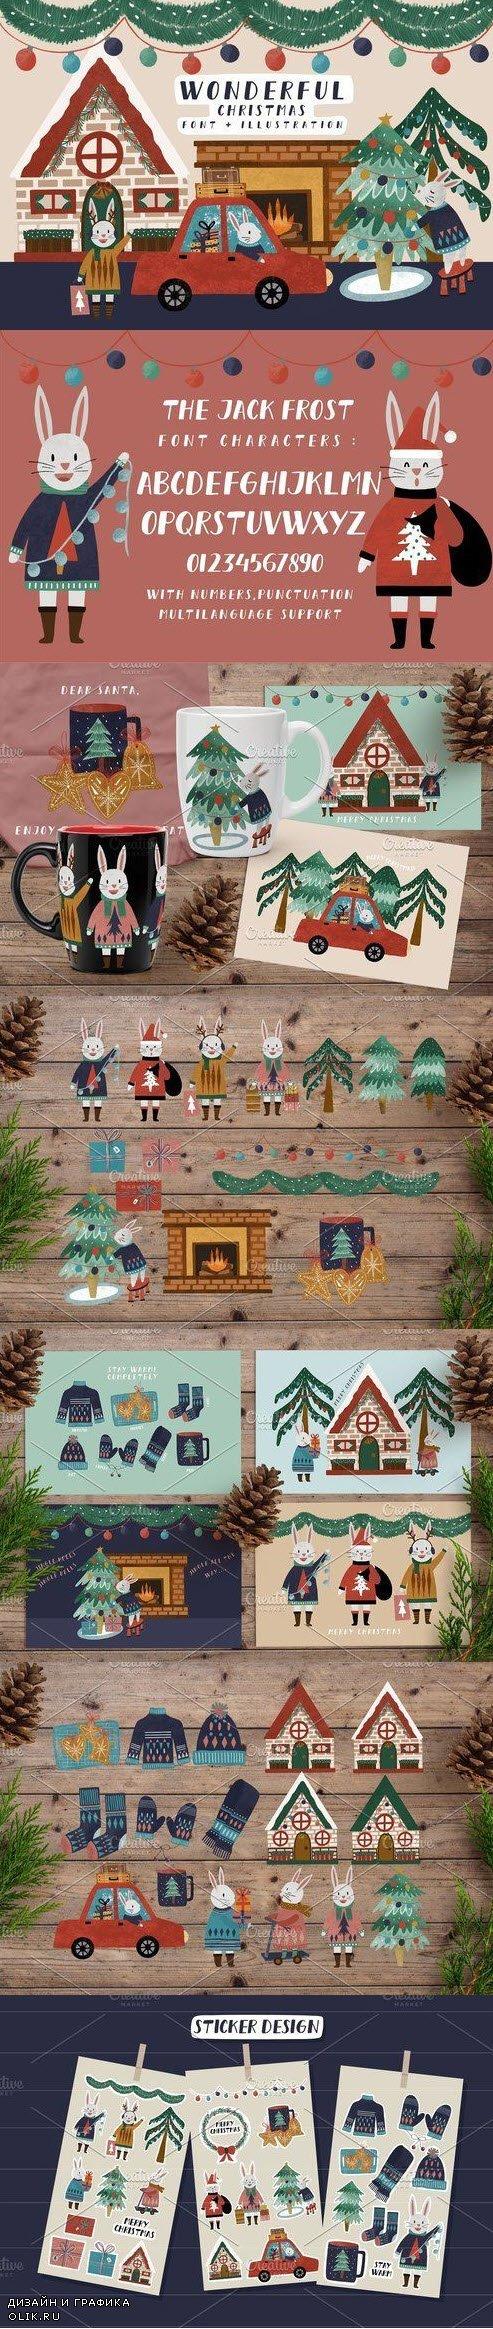 Wonderful Christmas - 4308031